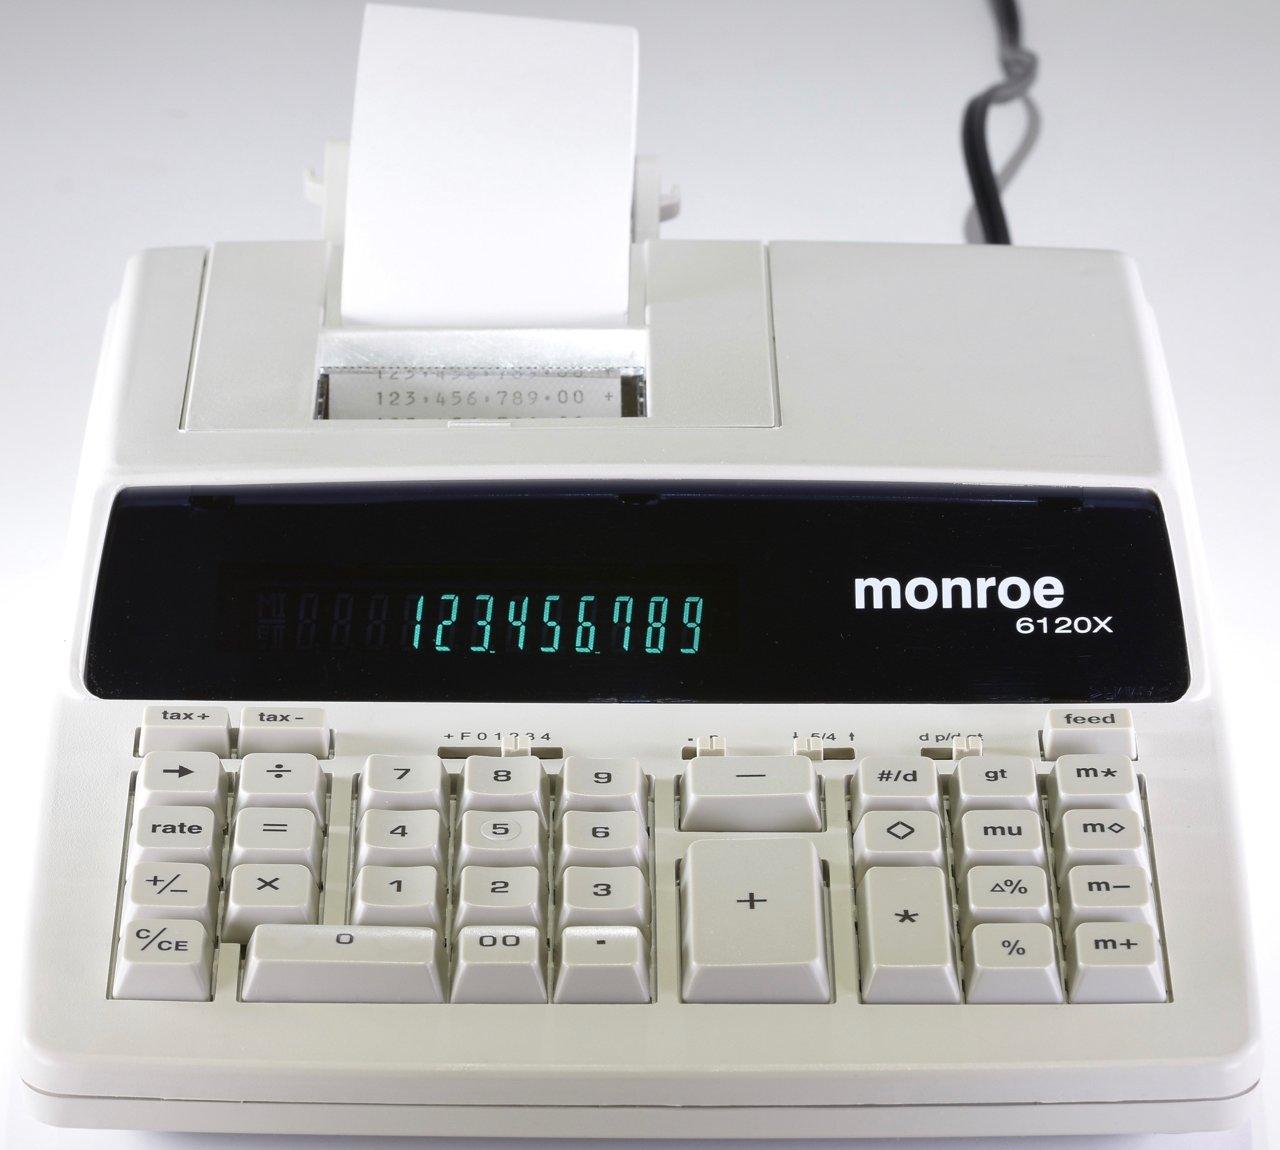 Genuine Monroe Ivory 6120X 12-Digit Print/Display Business Medium-Duty Calculator